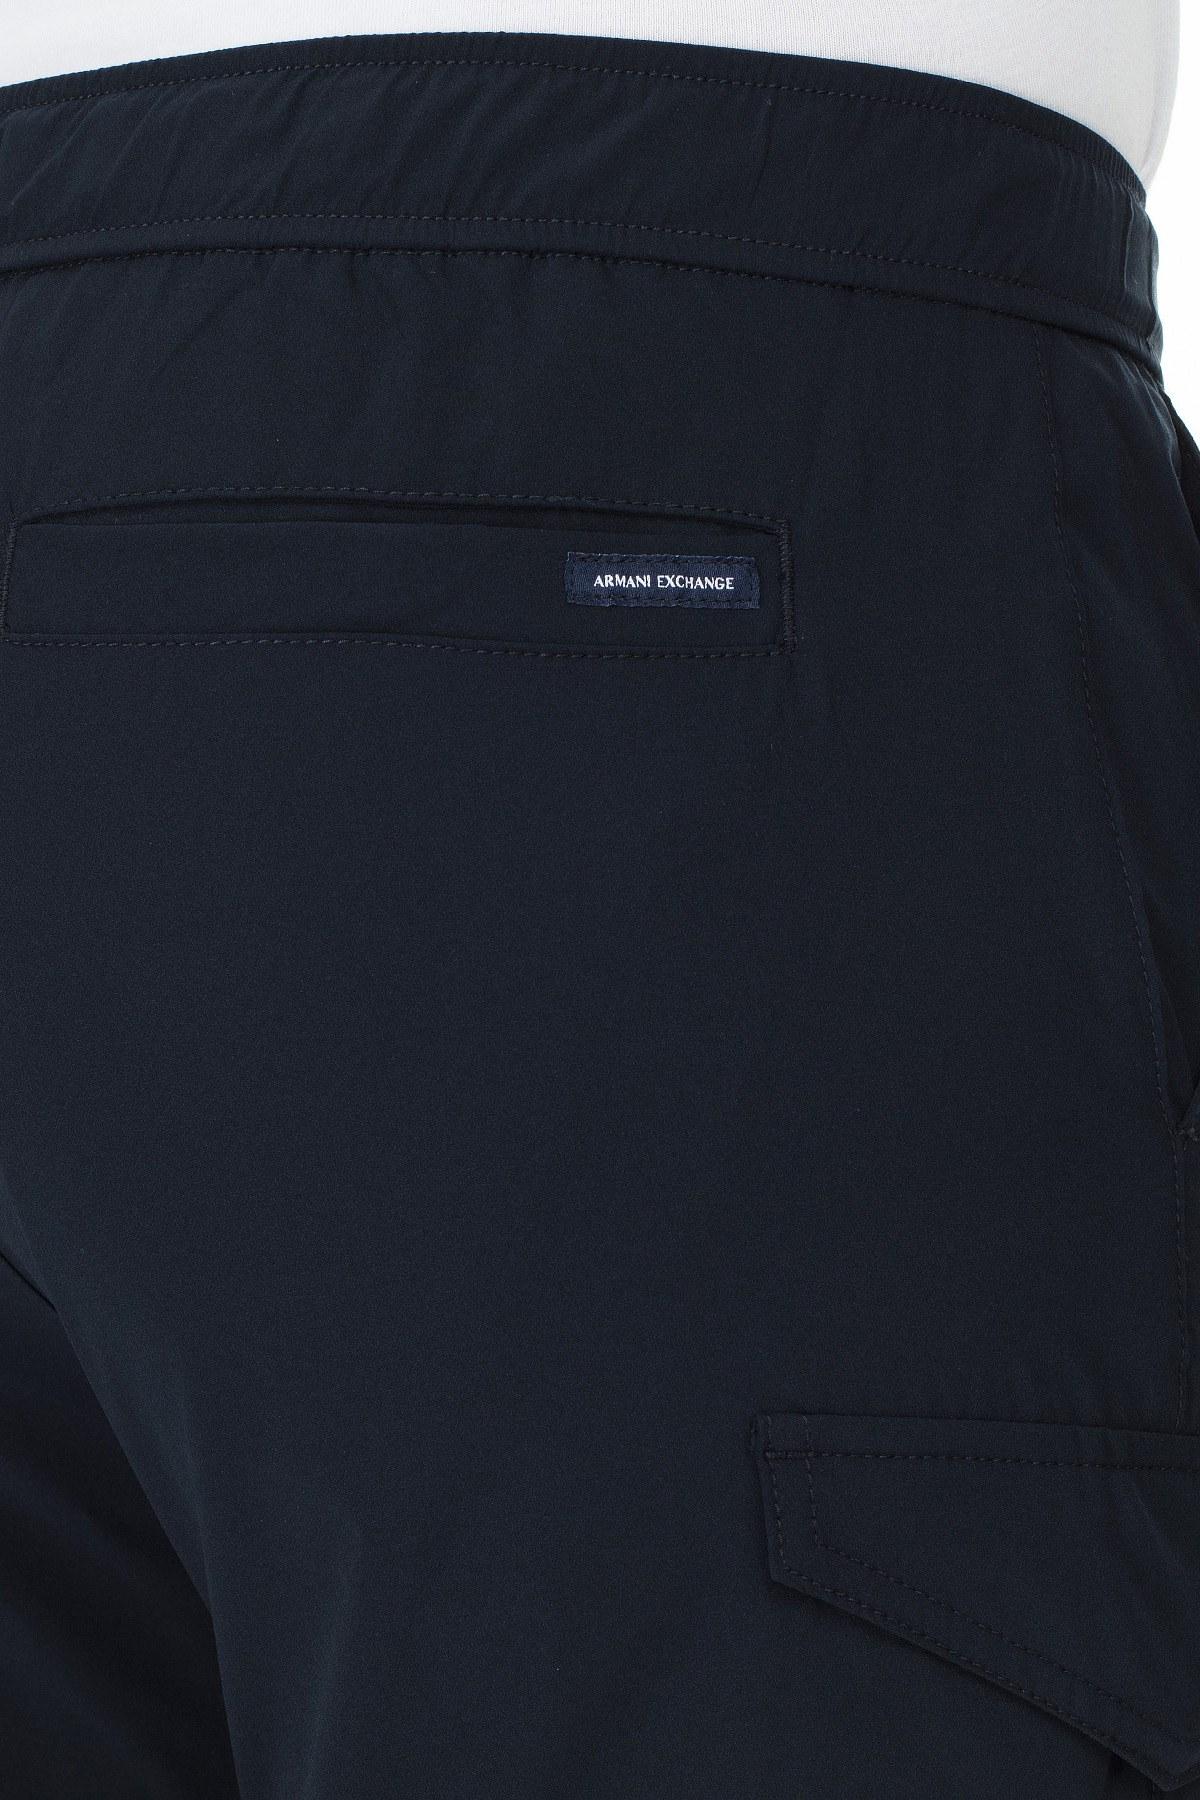 Armani Exchange Kemerli Paçası Lastikli Bol Kesim Erkek Pantolon 3HZP18 ZNHQZ 1510 LACİVERT